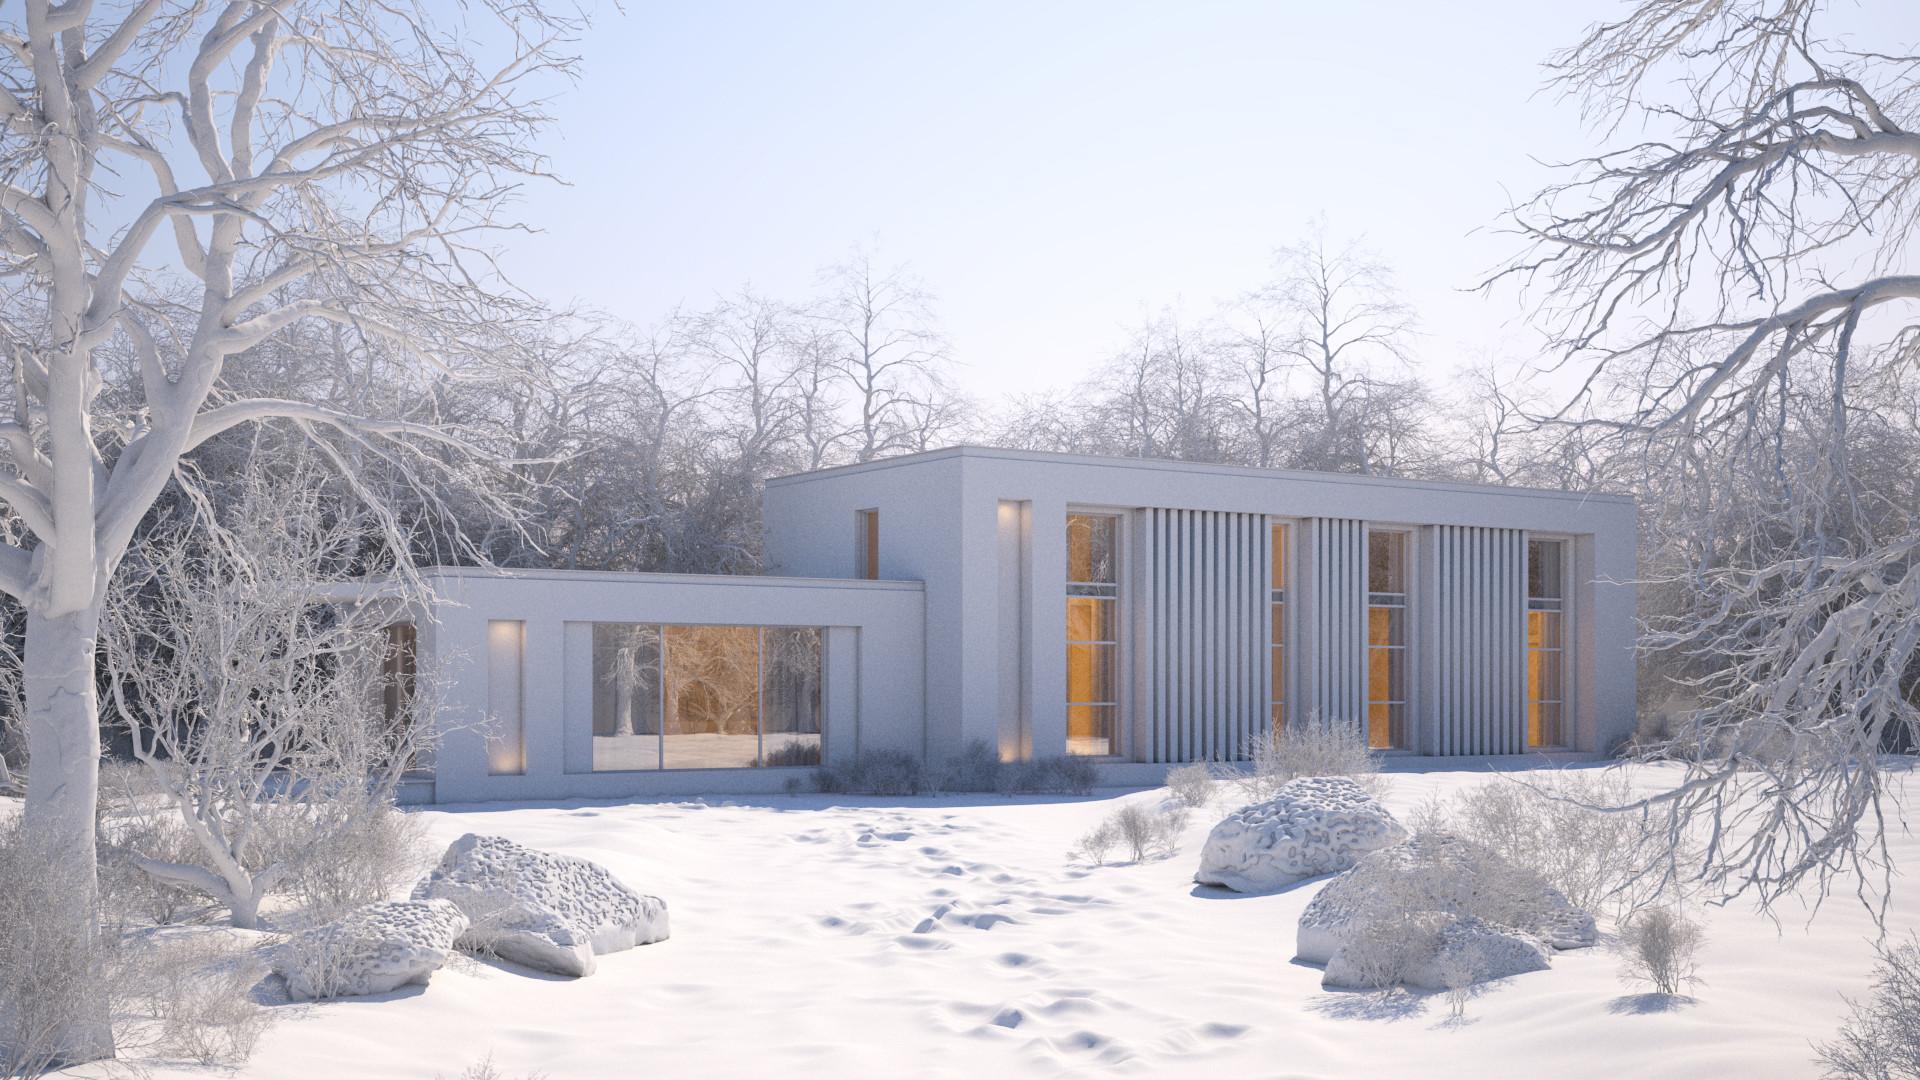 ArtStation - Making of 3dsmax Vray Winter Scene, taskin altinel